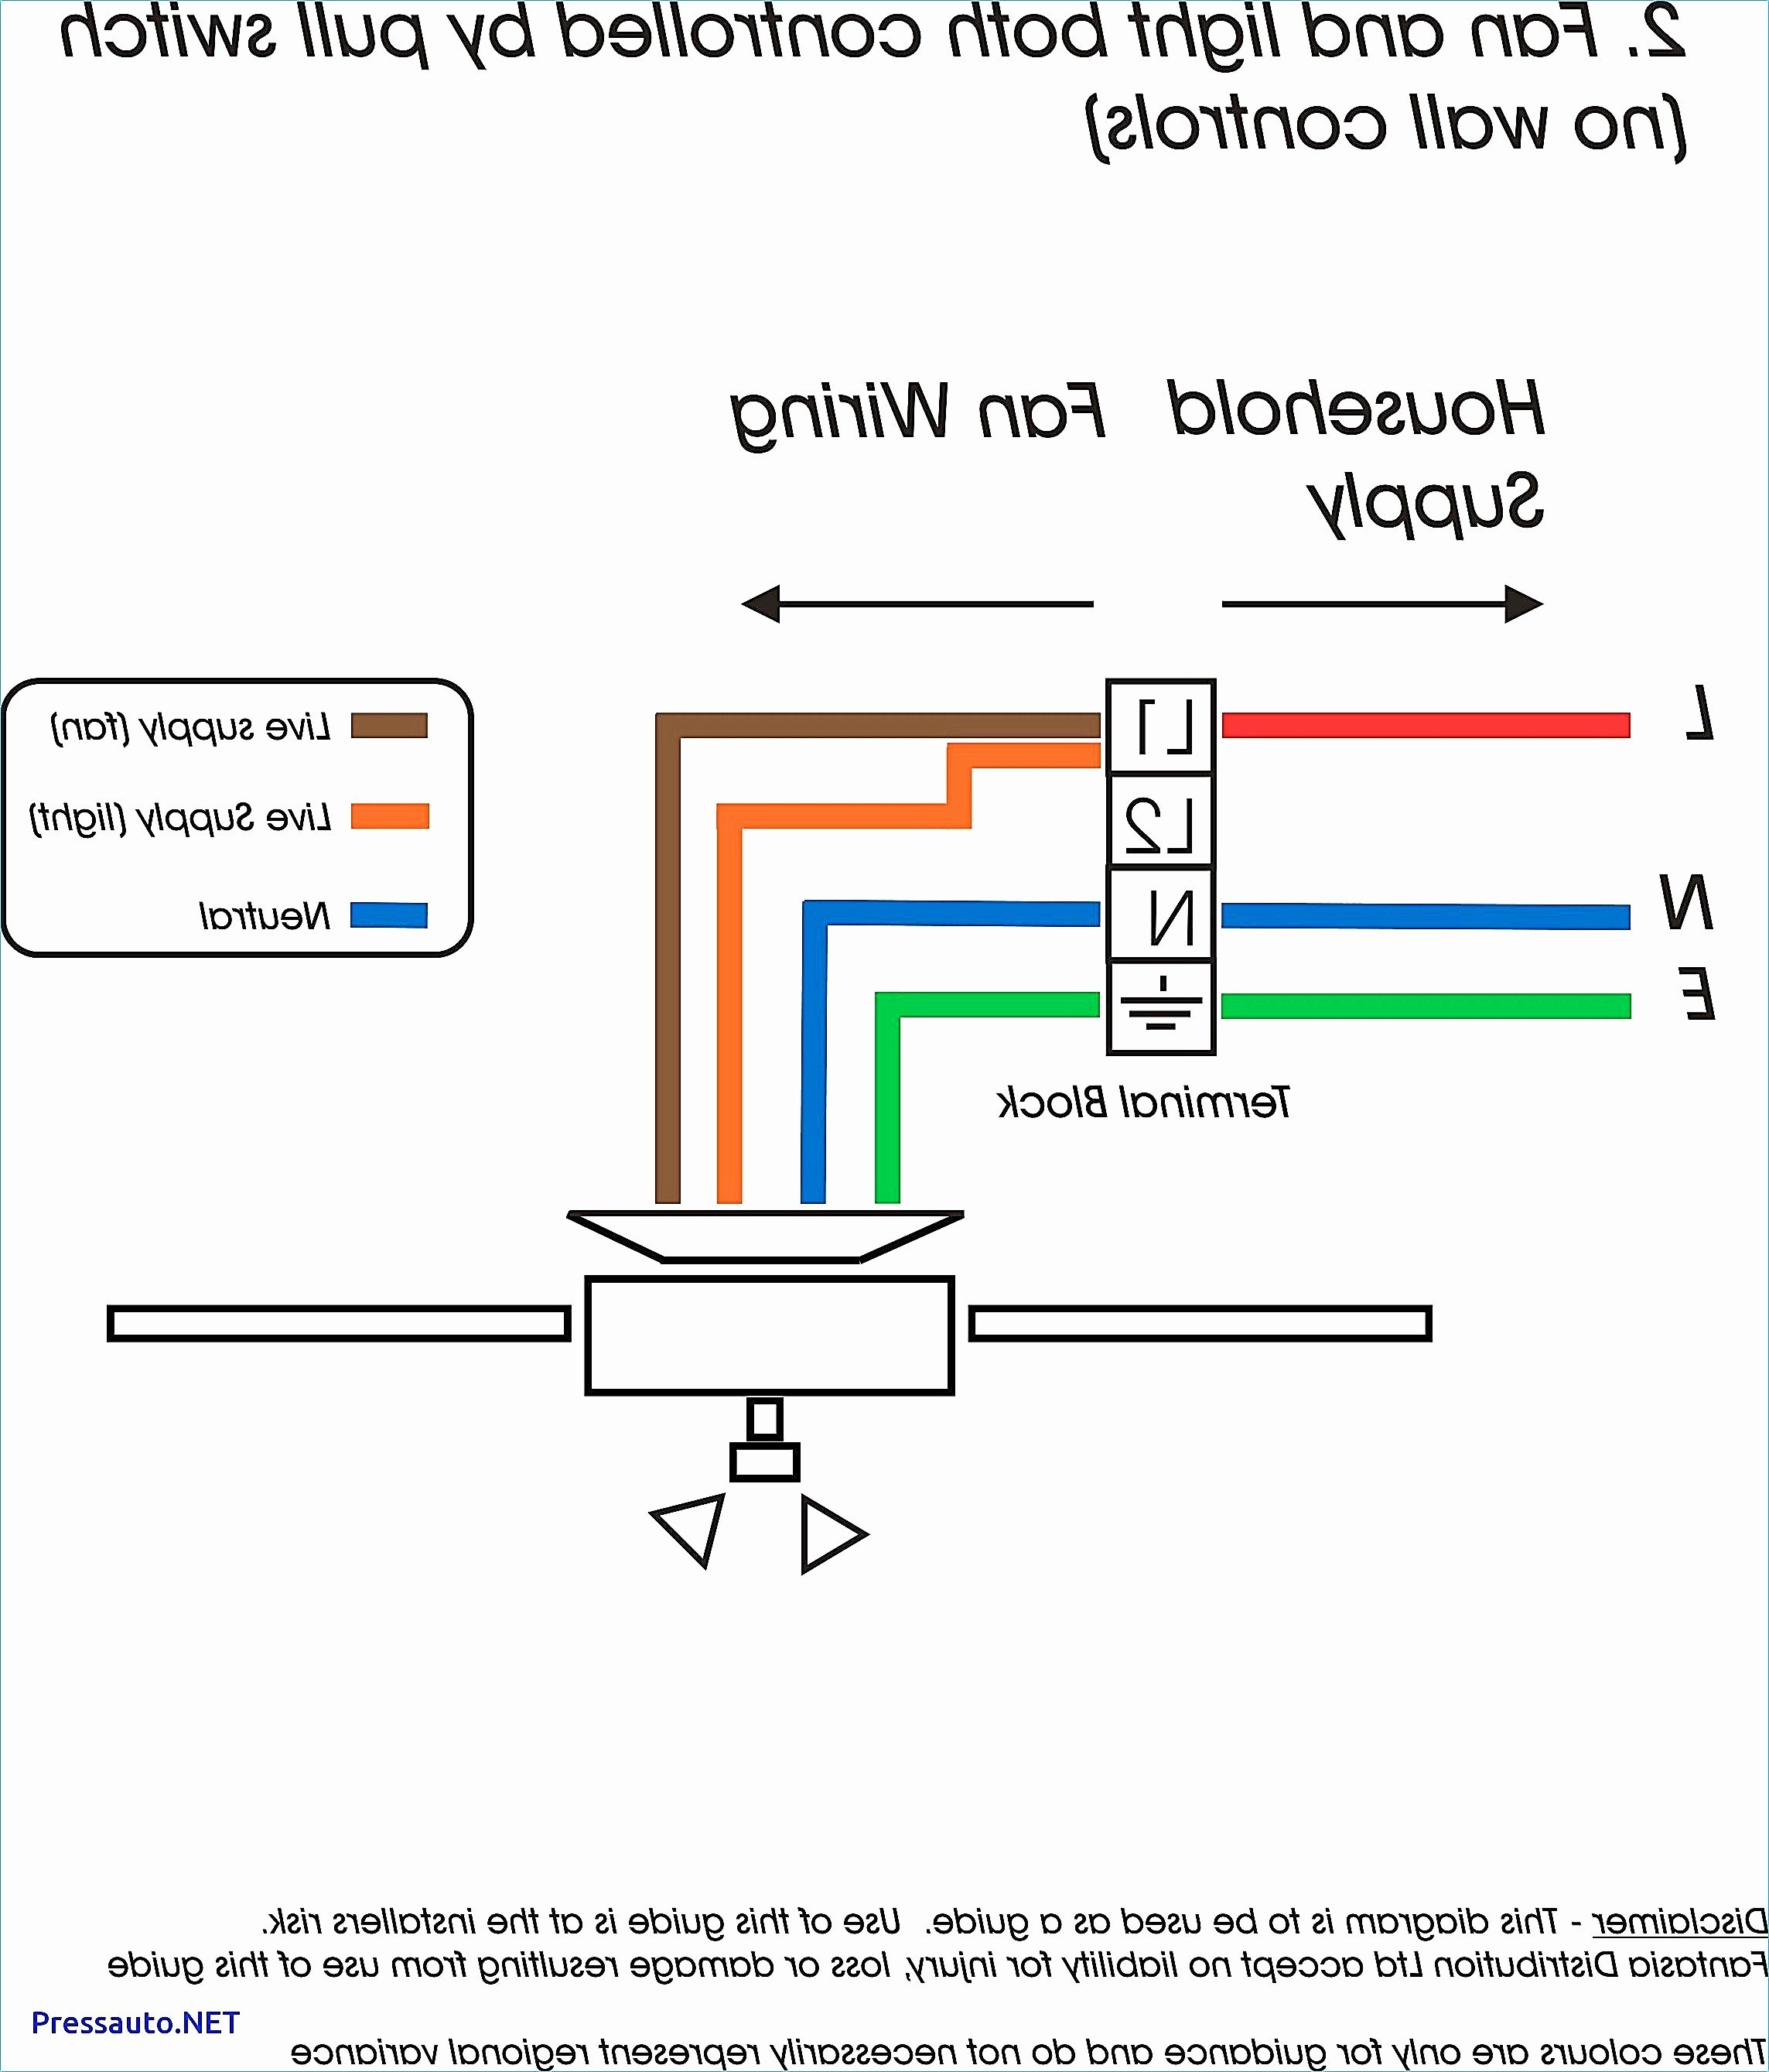 ceiling occupancy sensor wiring diagram Download-ceiling occupancy sensor wiring diagram Download Dual Relay Wiring Diagram Refrence 4 Pin Relay Wiring 17-m